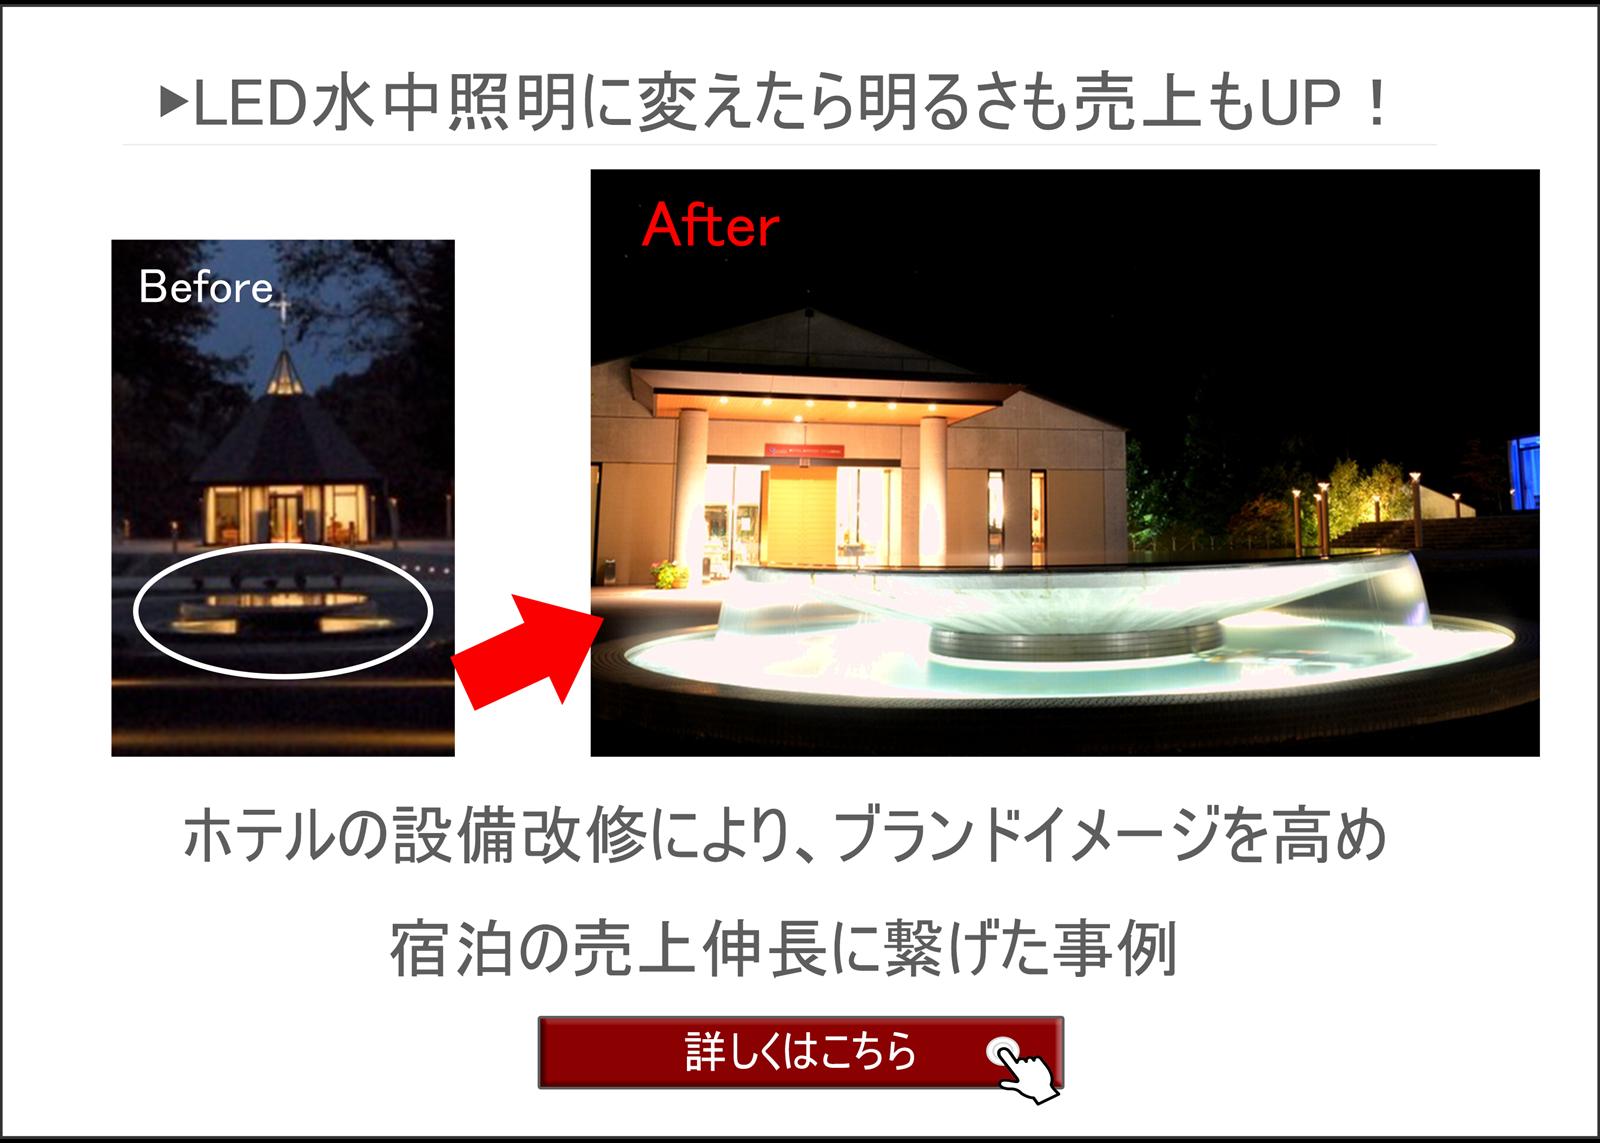 LED水中照明に変えたら明るさも売上もアップ